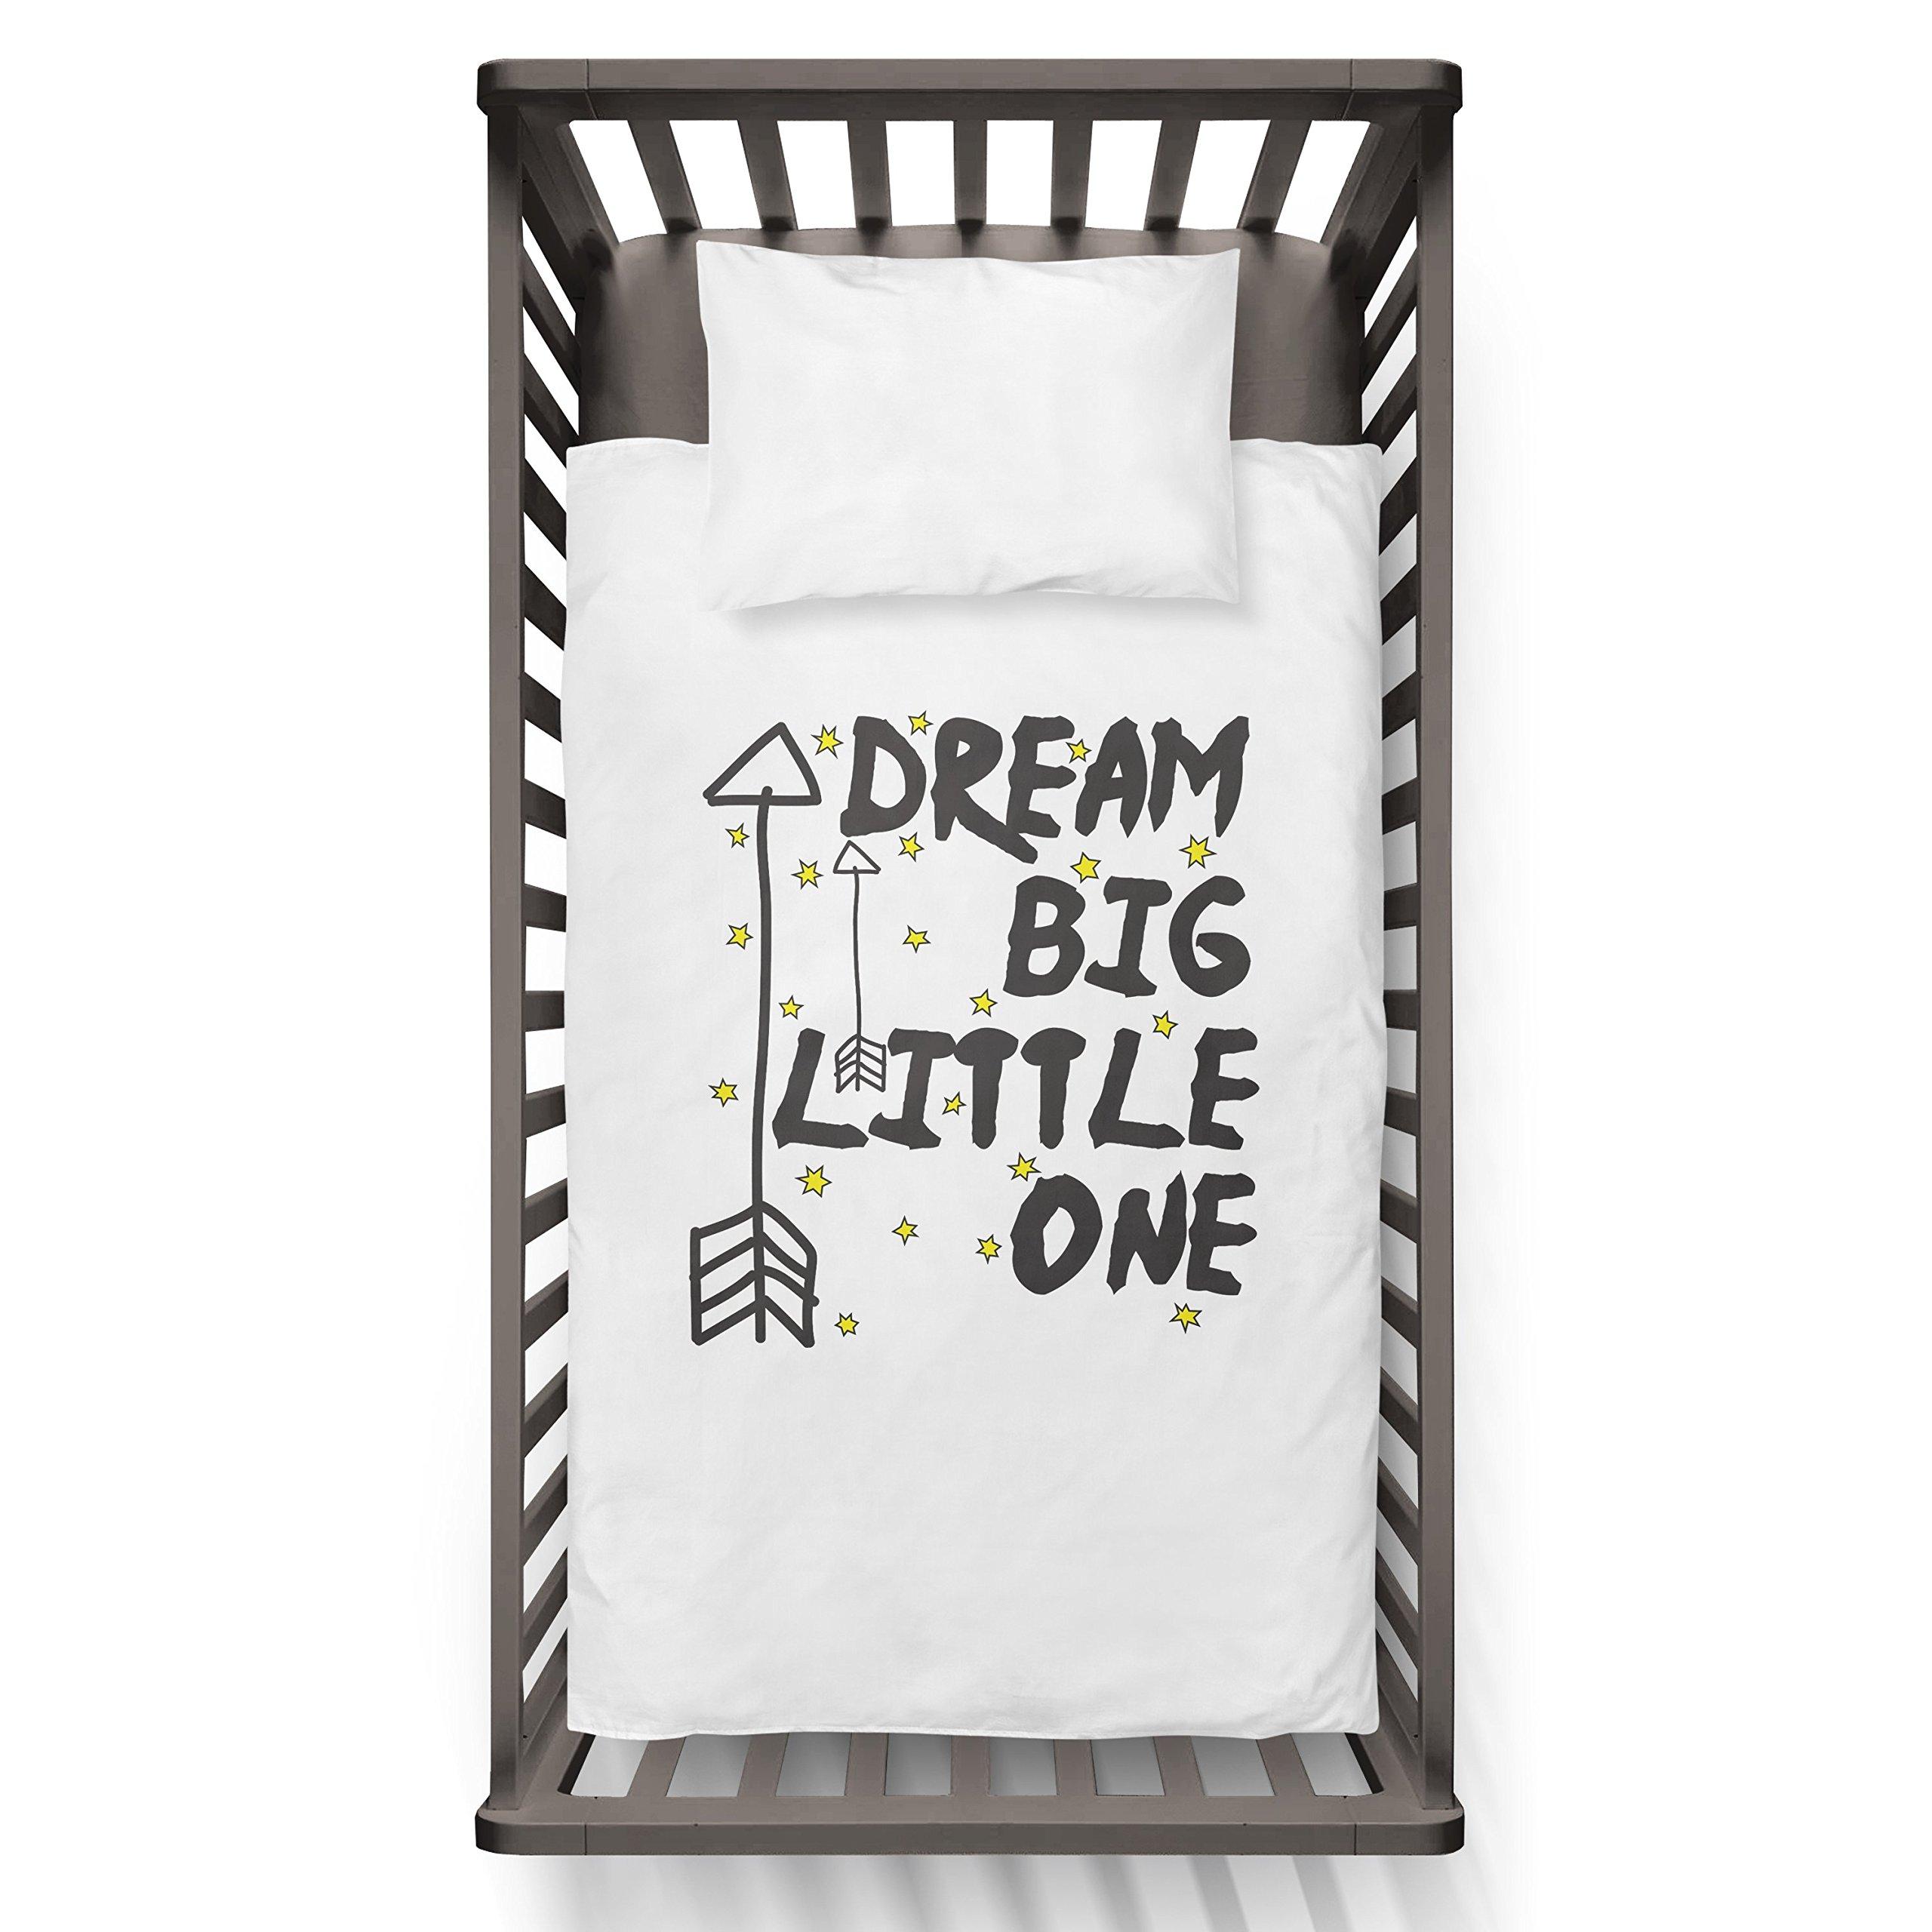 Dream Big Little One Funny Humor Hip Baby Duvet /Pillow set,Toddler Duvet,Oeko-Tex,Personalized duvet and pillow,Oraganic,gift